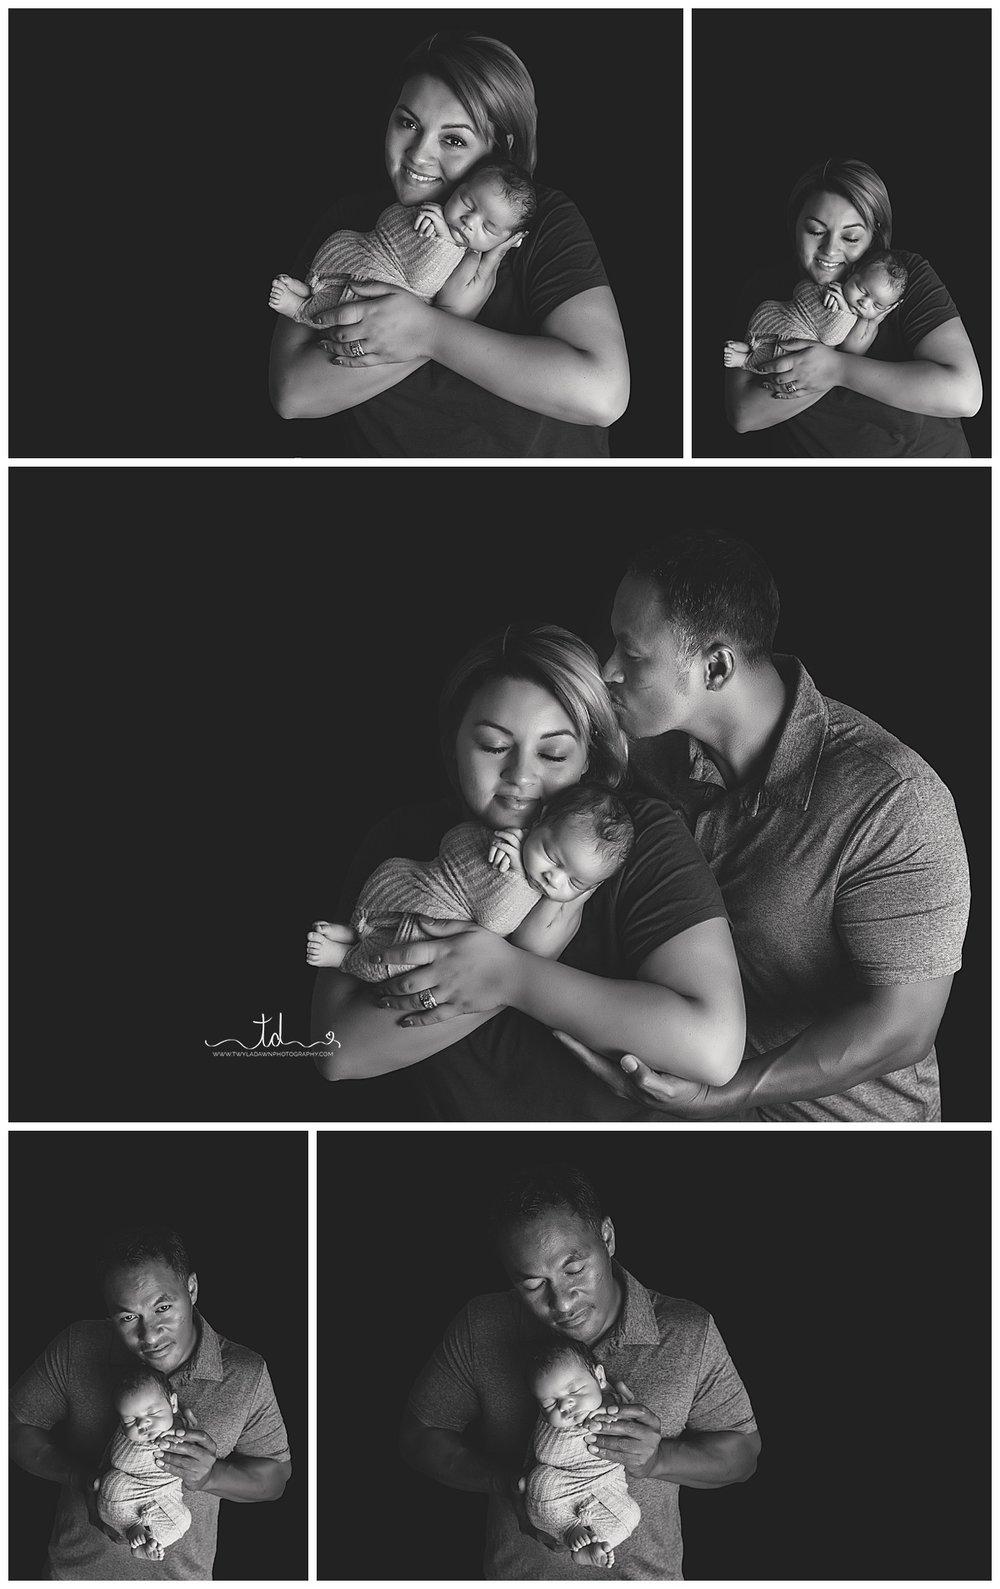 Black and White Parent with Newborn Portraits | Parents with Newborn Baby | Newborn posing with parents | Salt Lake City Newborn Photographer | Twyla Dawn Photography